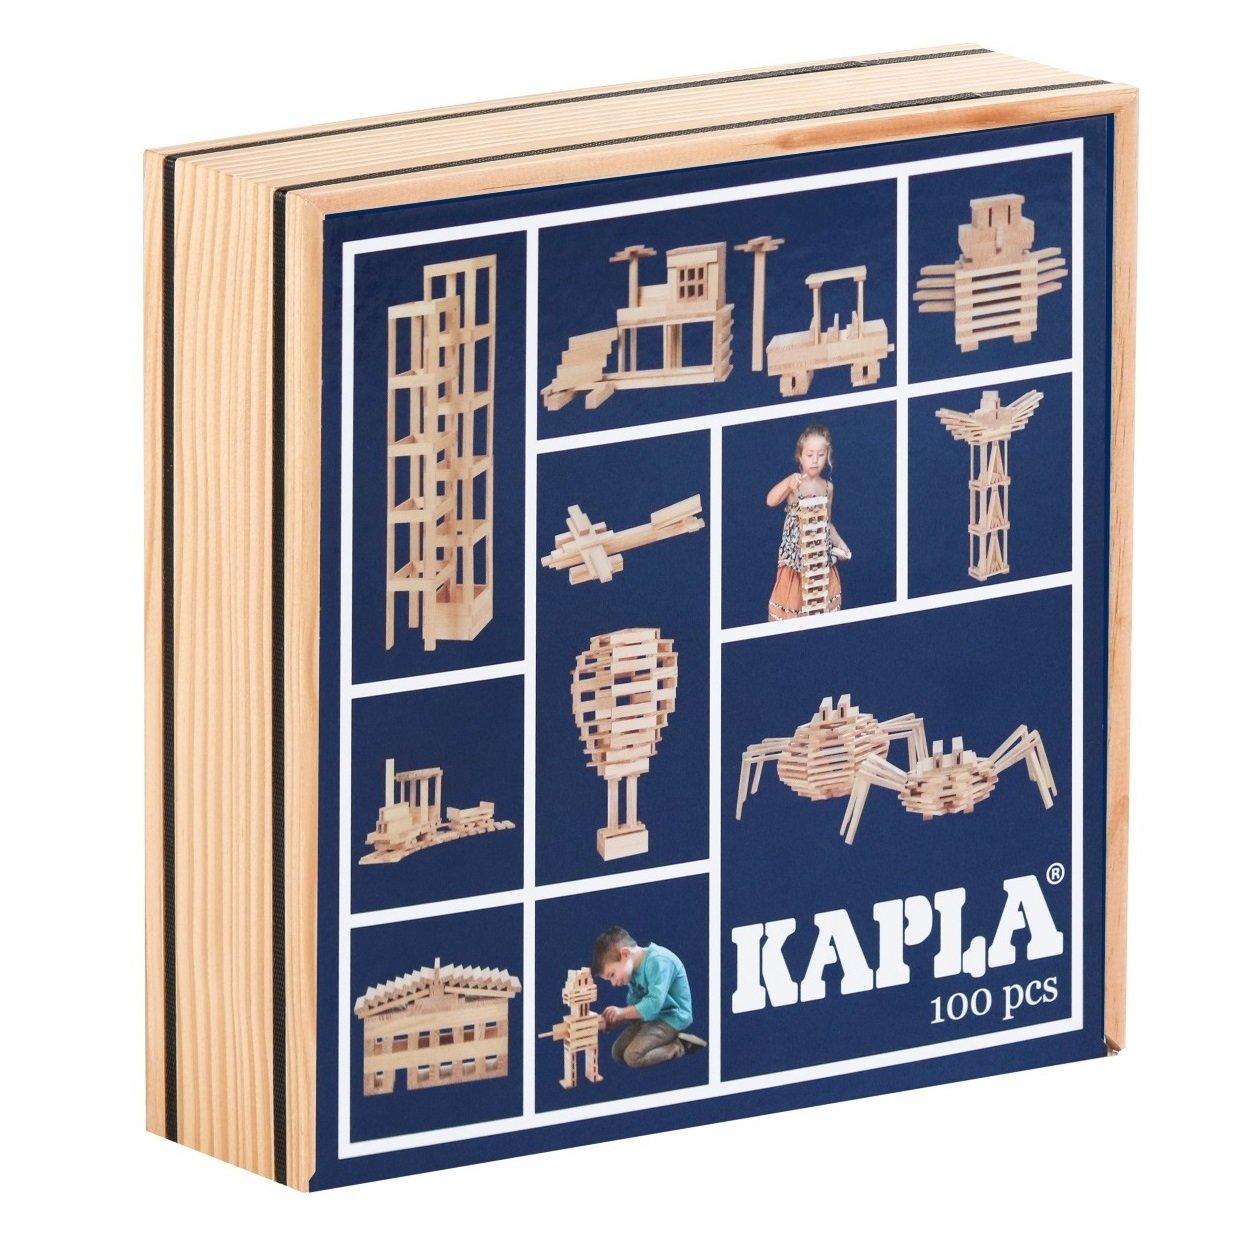 Kapla Wooden Toy Game